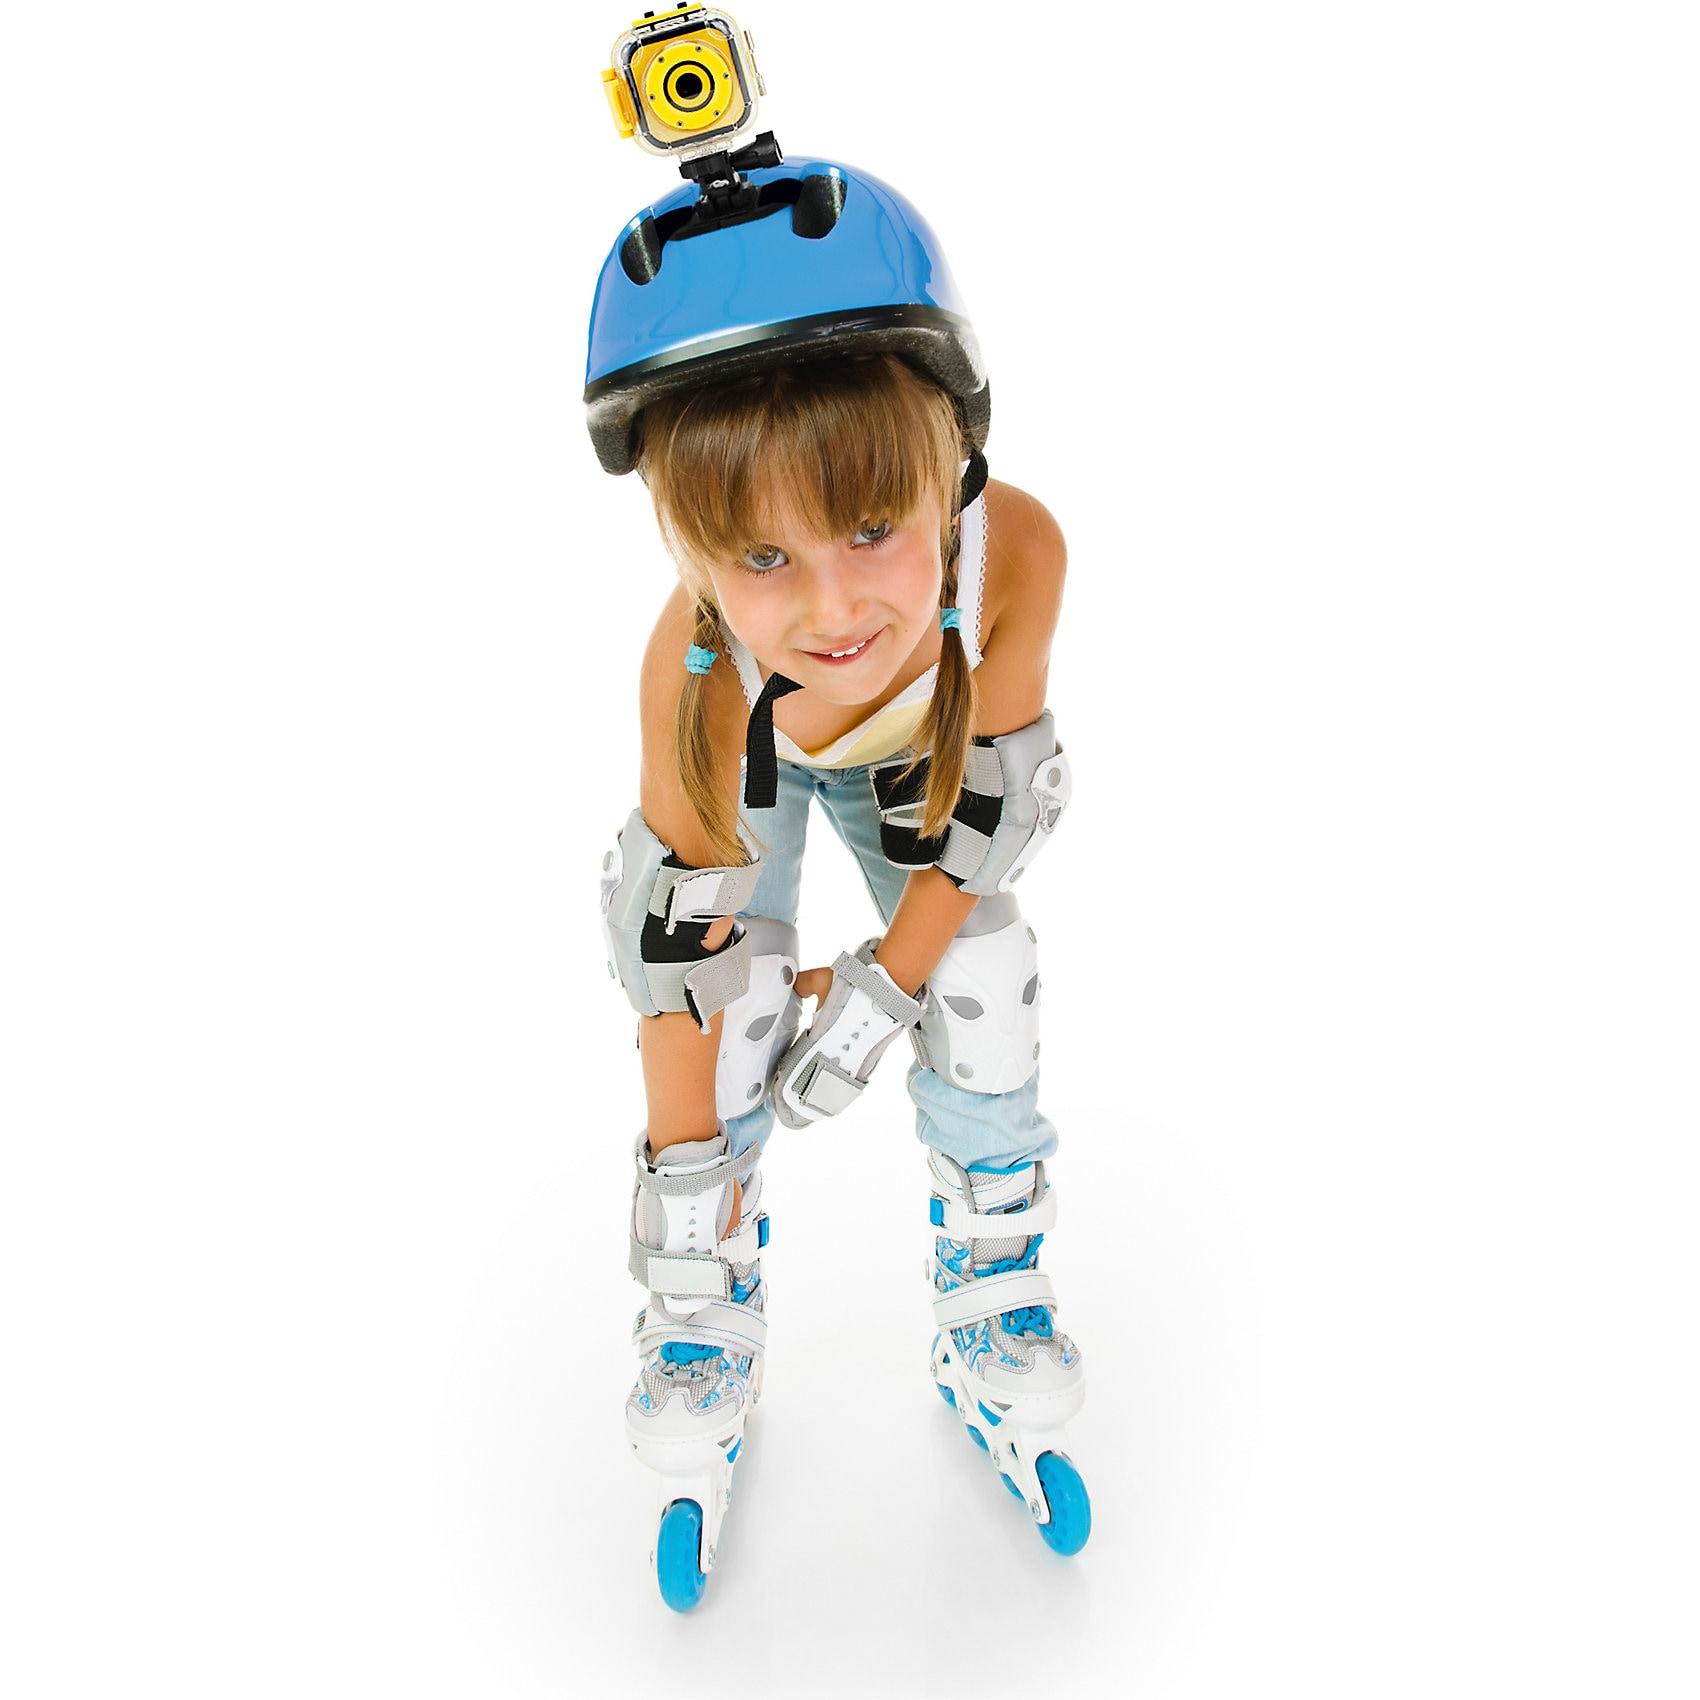 Easypix Panox Champion Kids Action Cam